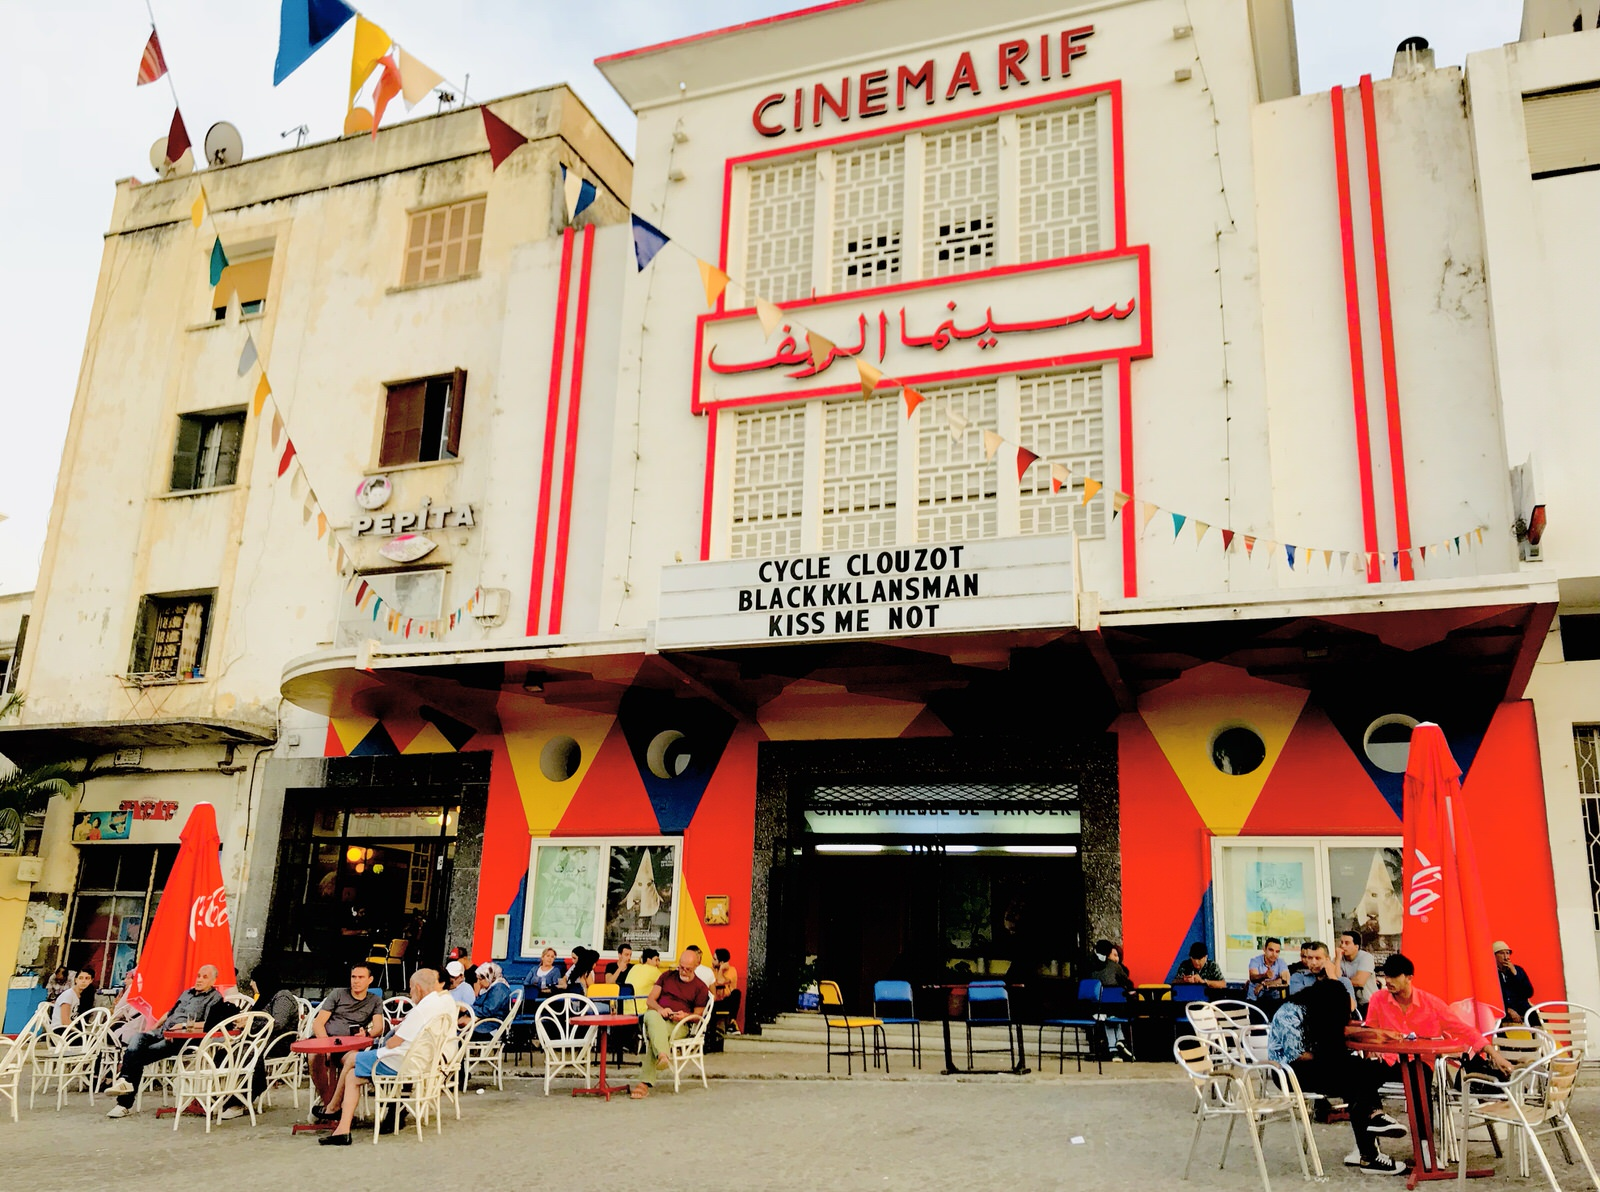 cinema-rif-tangier-morocco-e63f350bf6a5.jpg